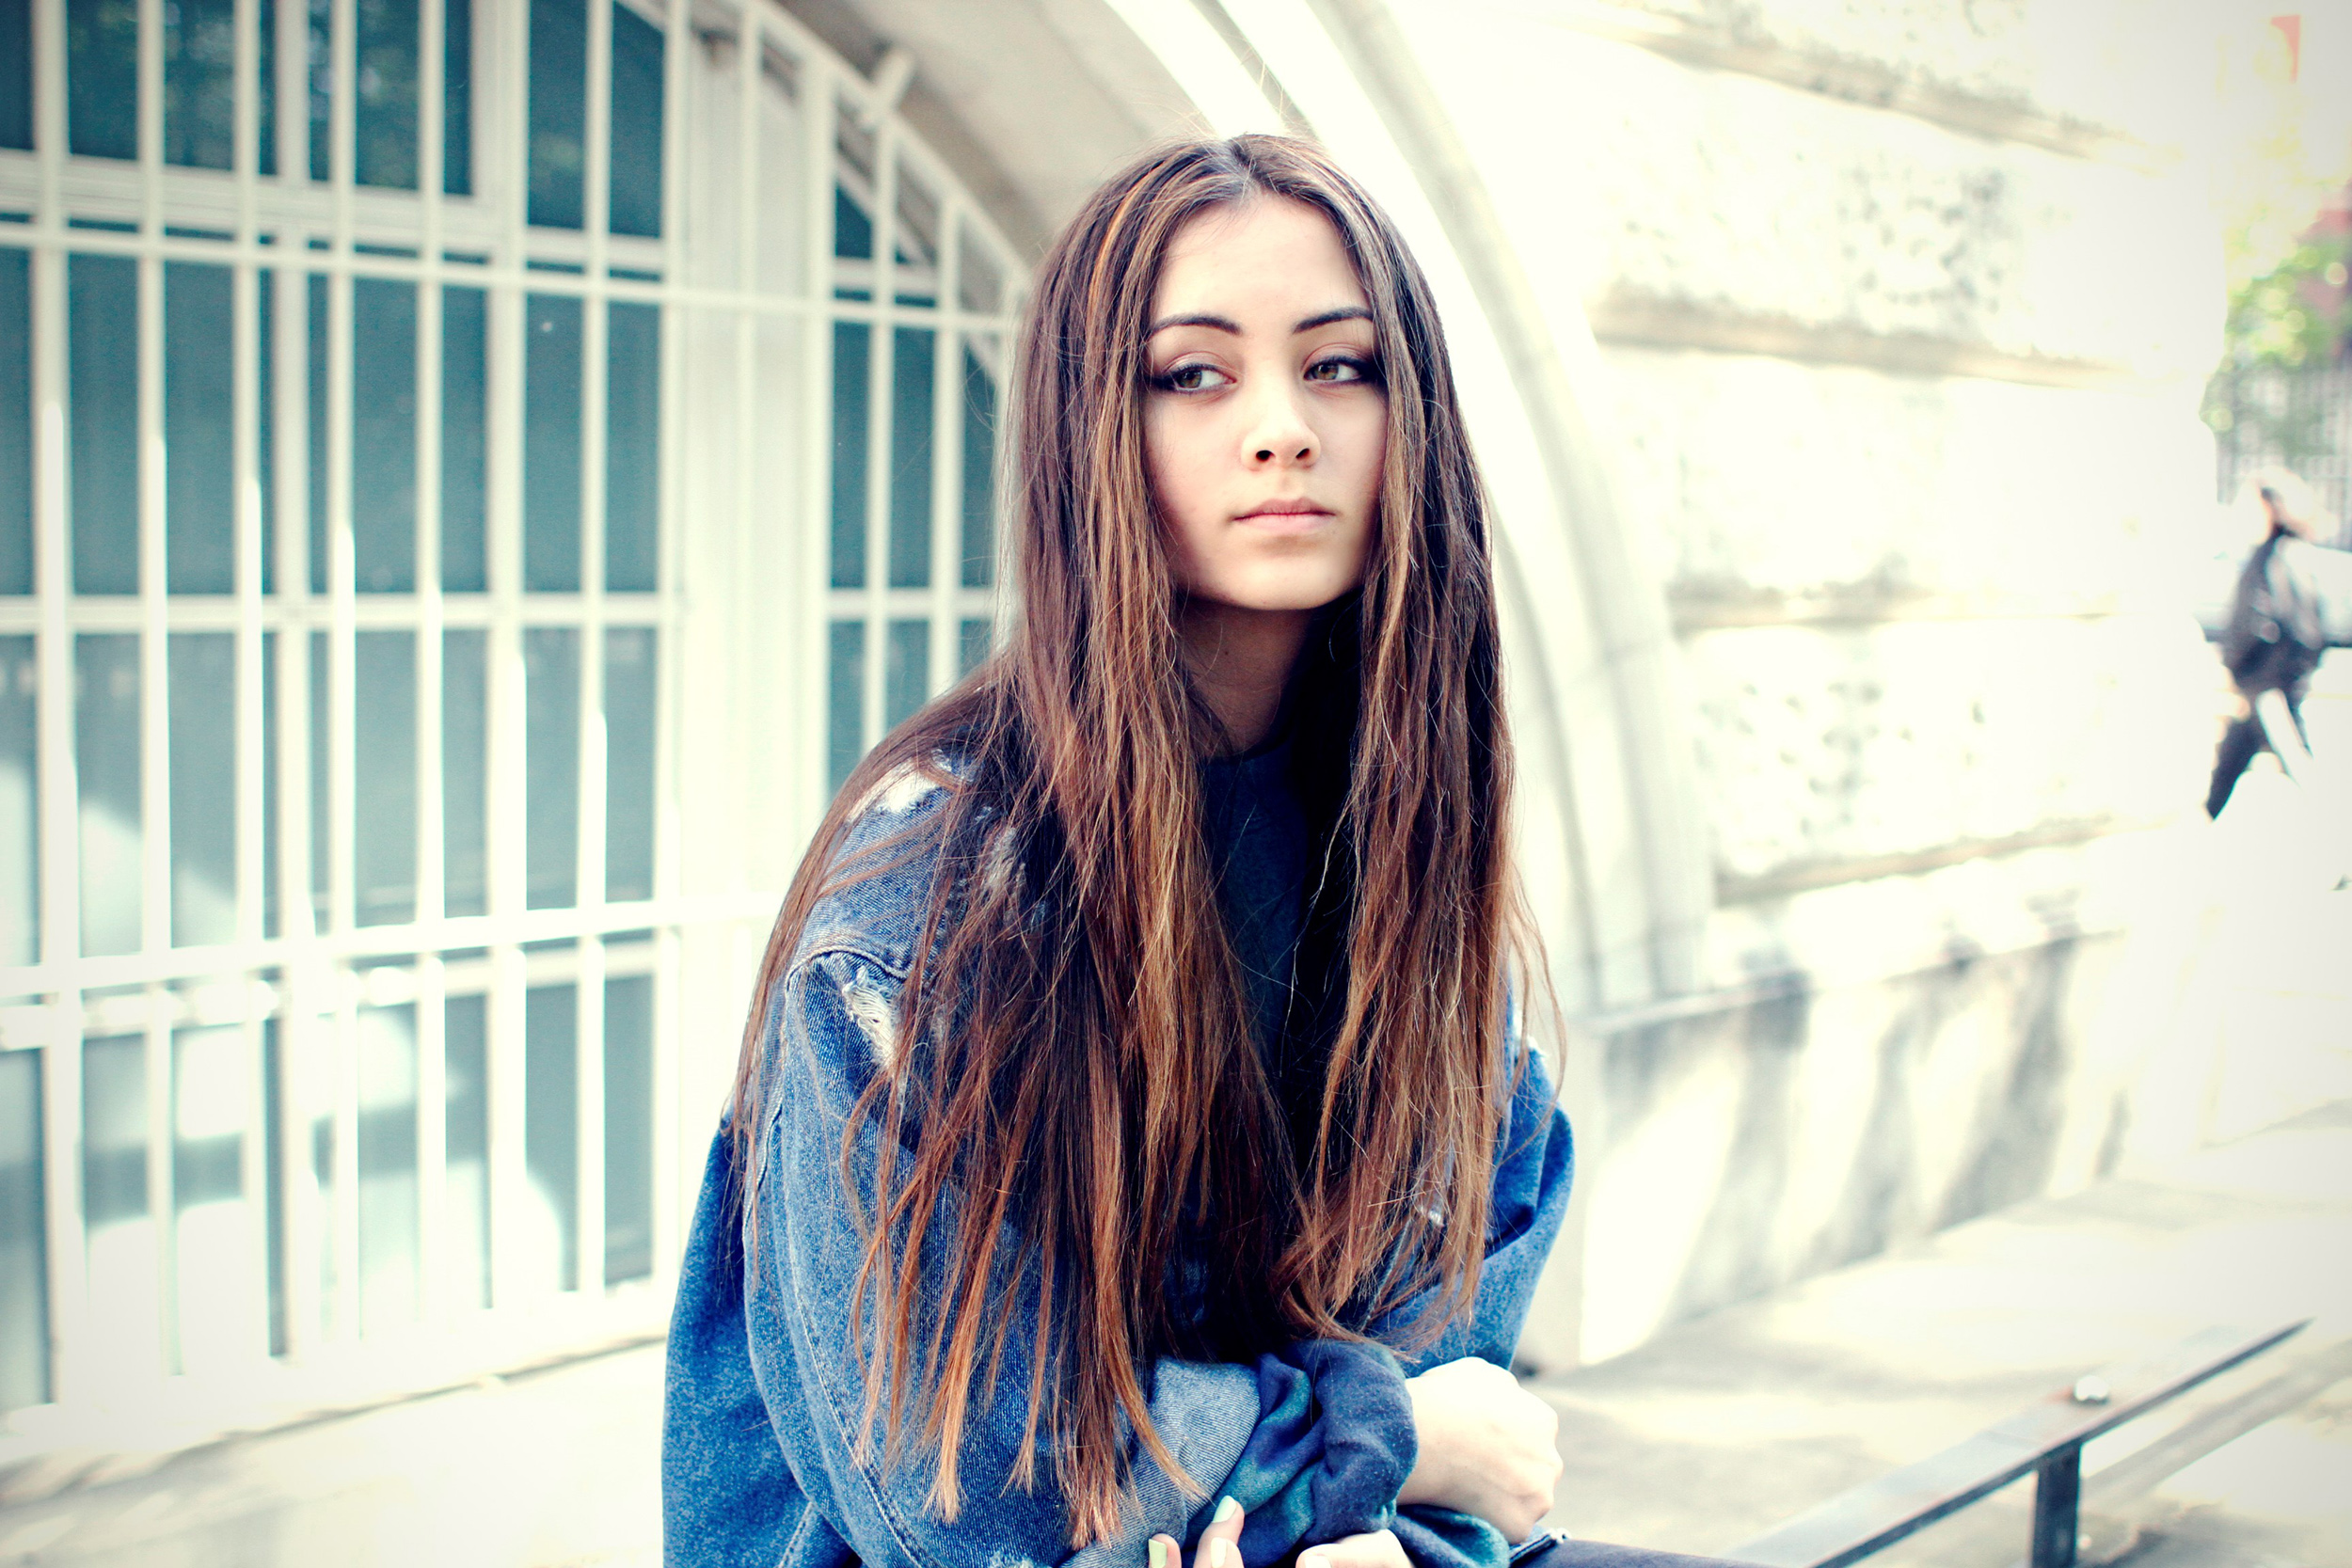 Jasmine Thompson Women Singer Brunette Long Hair Outdoors Urban Women Outdoors Jeans Jacket Jasmine 2500x1667